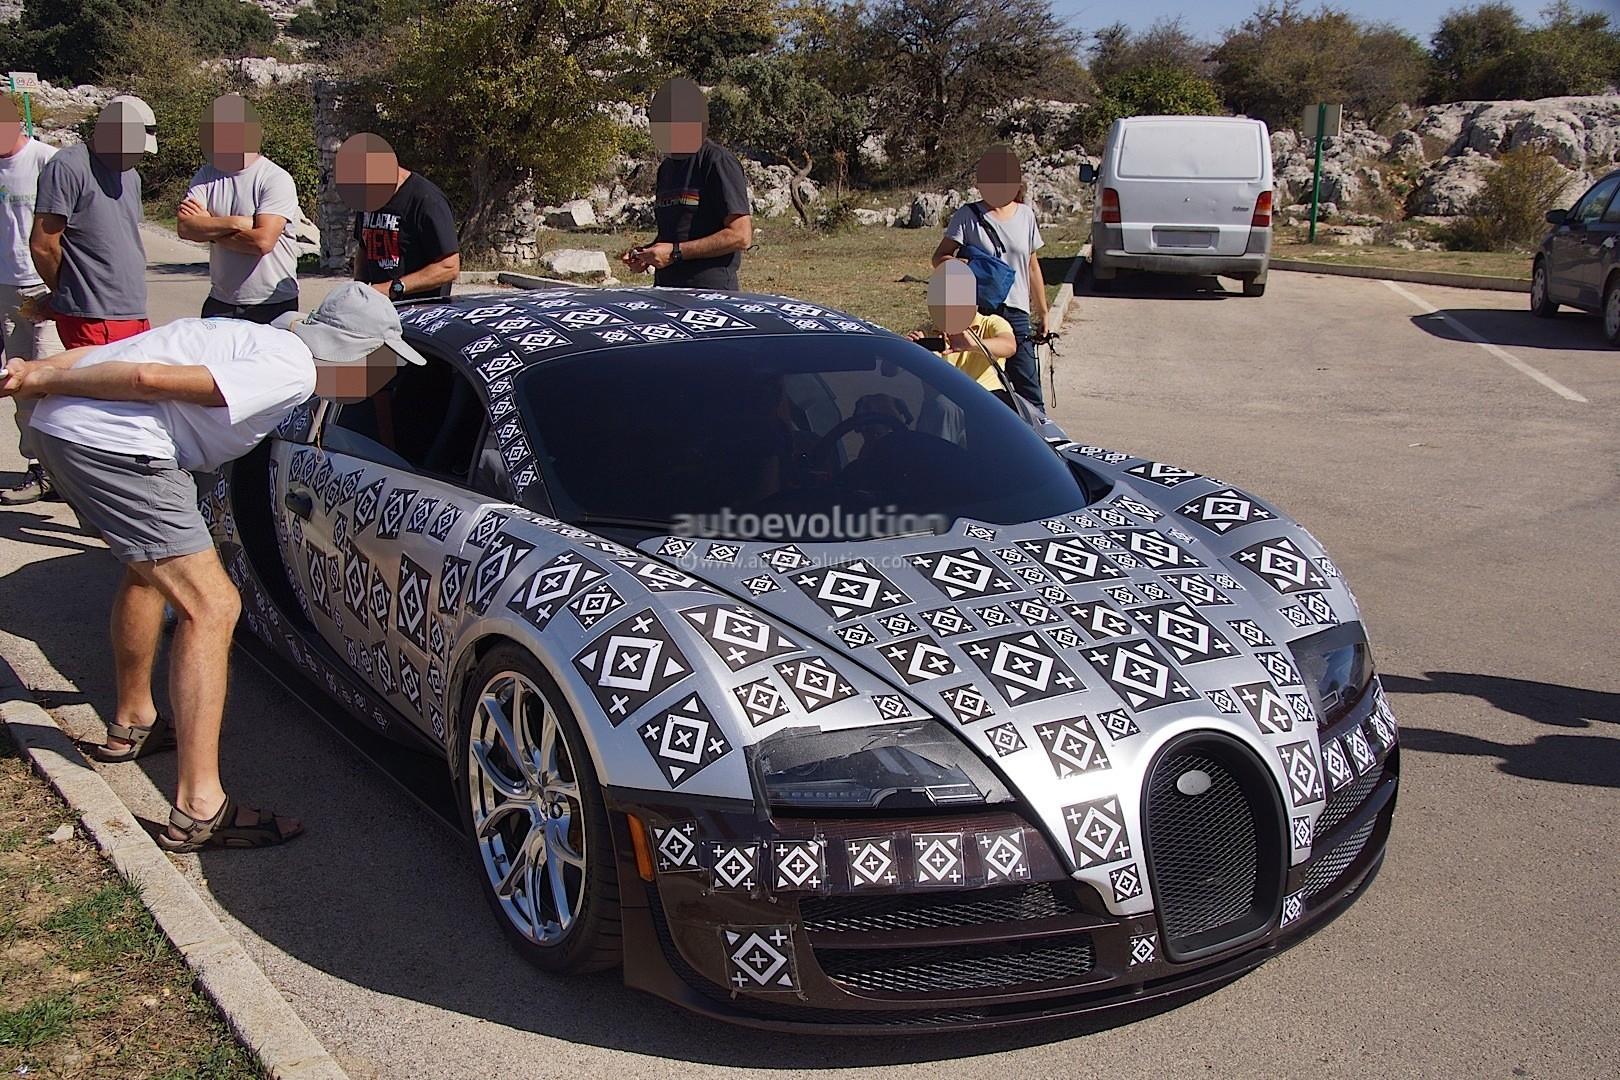 New Bugatti Chiron Teaser Released, Prepare for the Fastest Hybrid Car in the World - Video ...